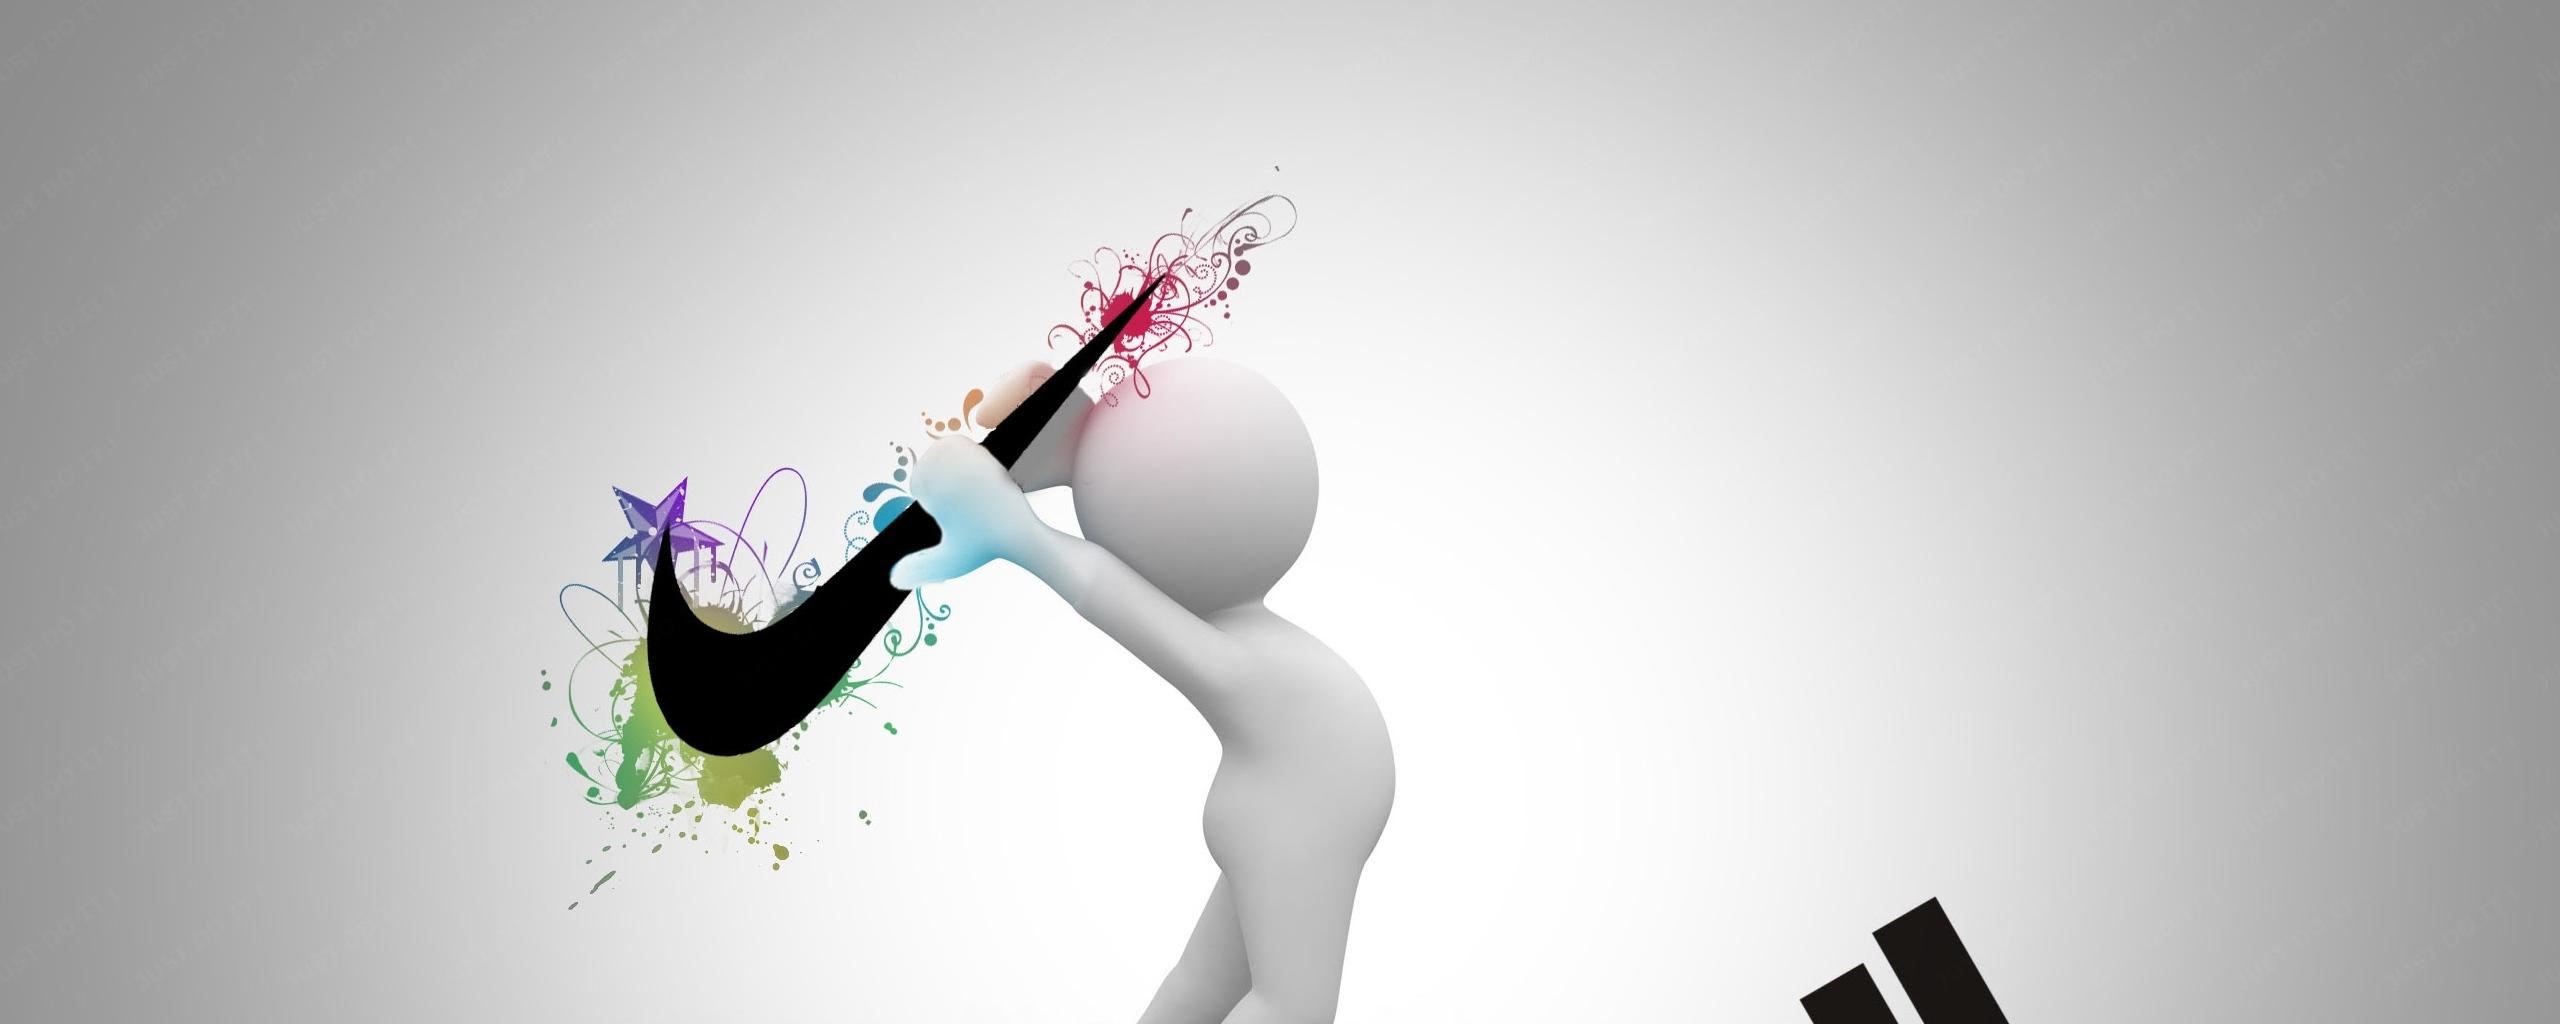 Adidas clipart floral Art nike clip Confrontation confrontation